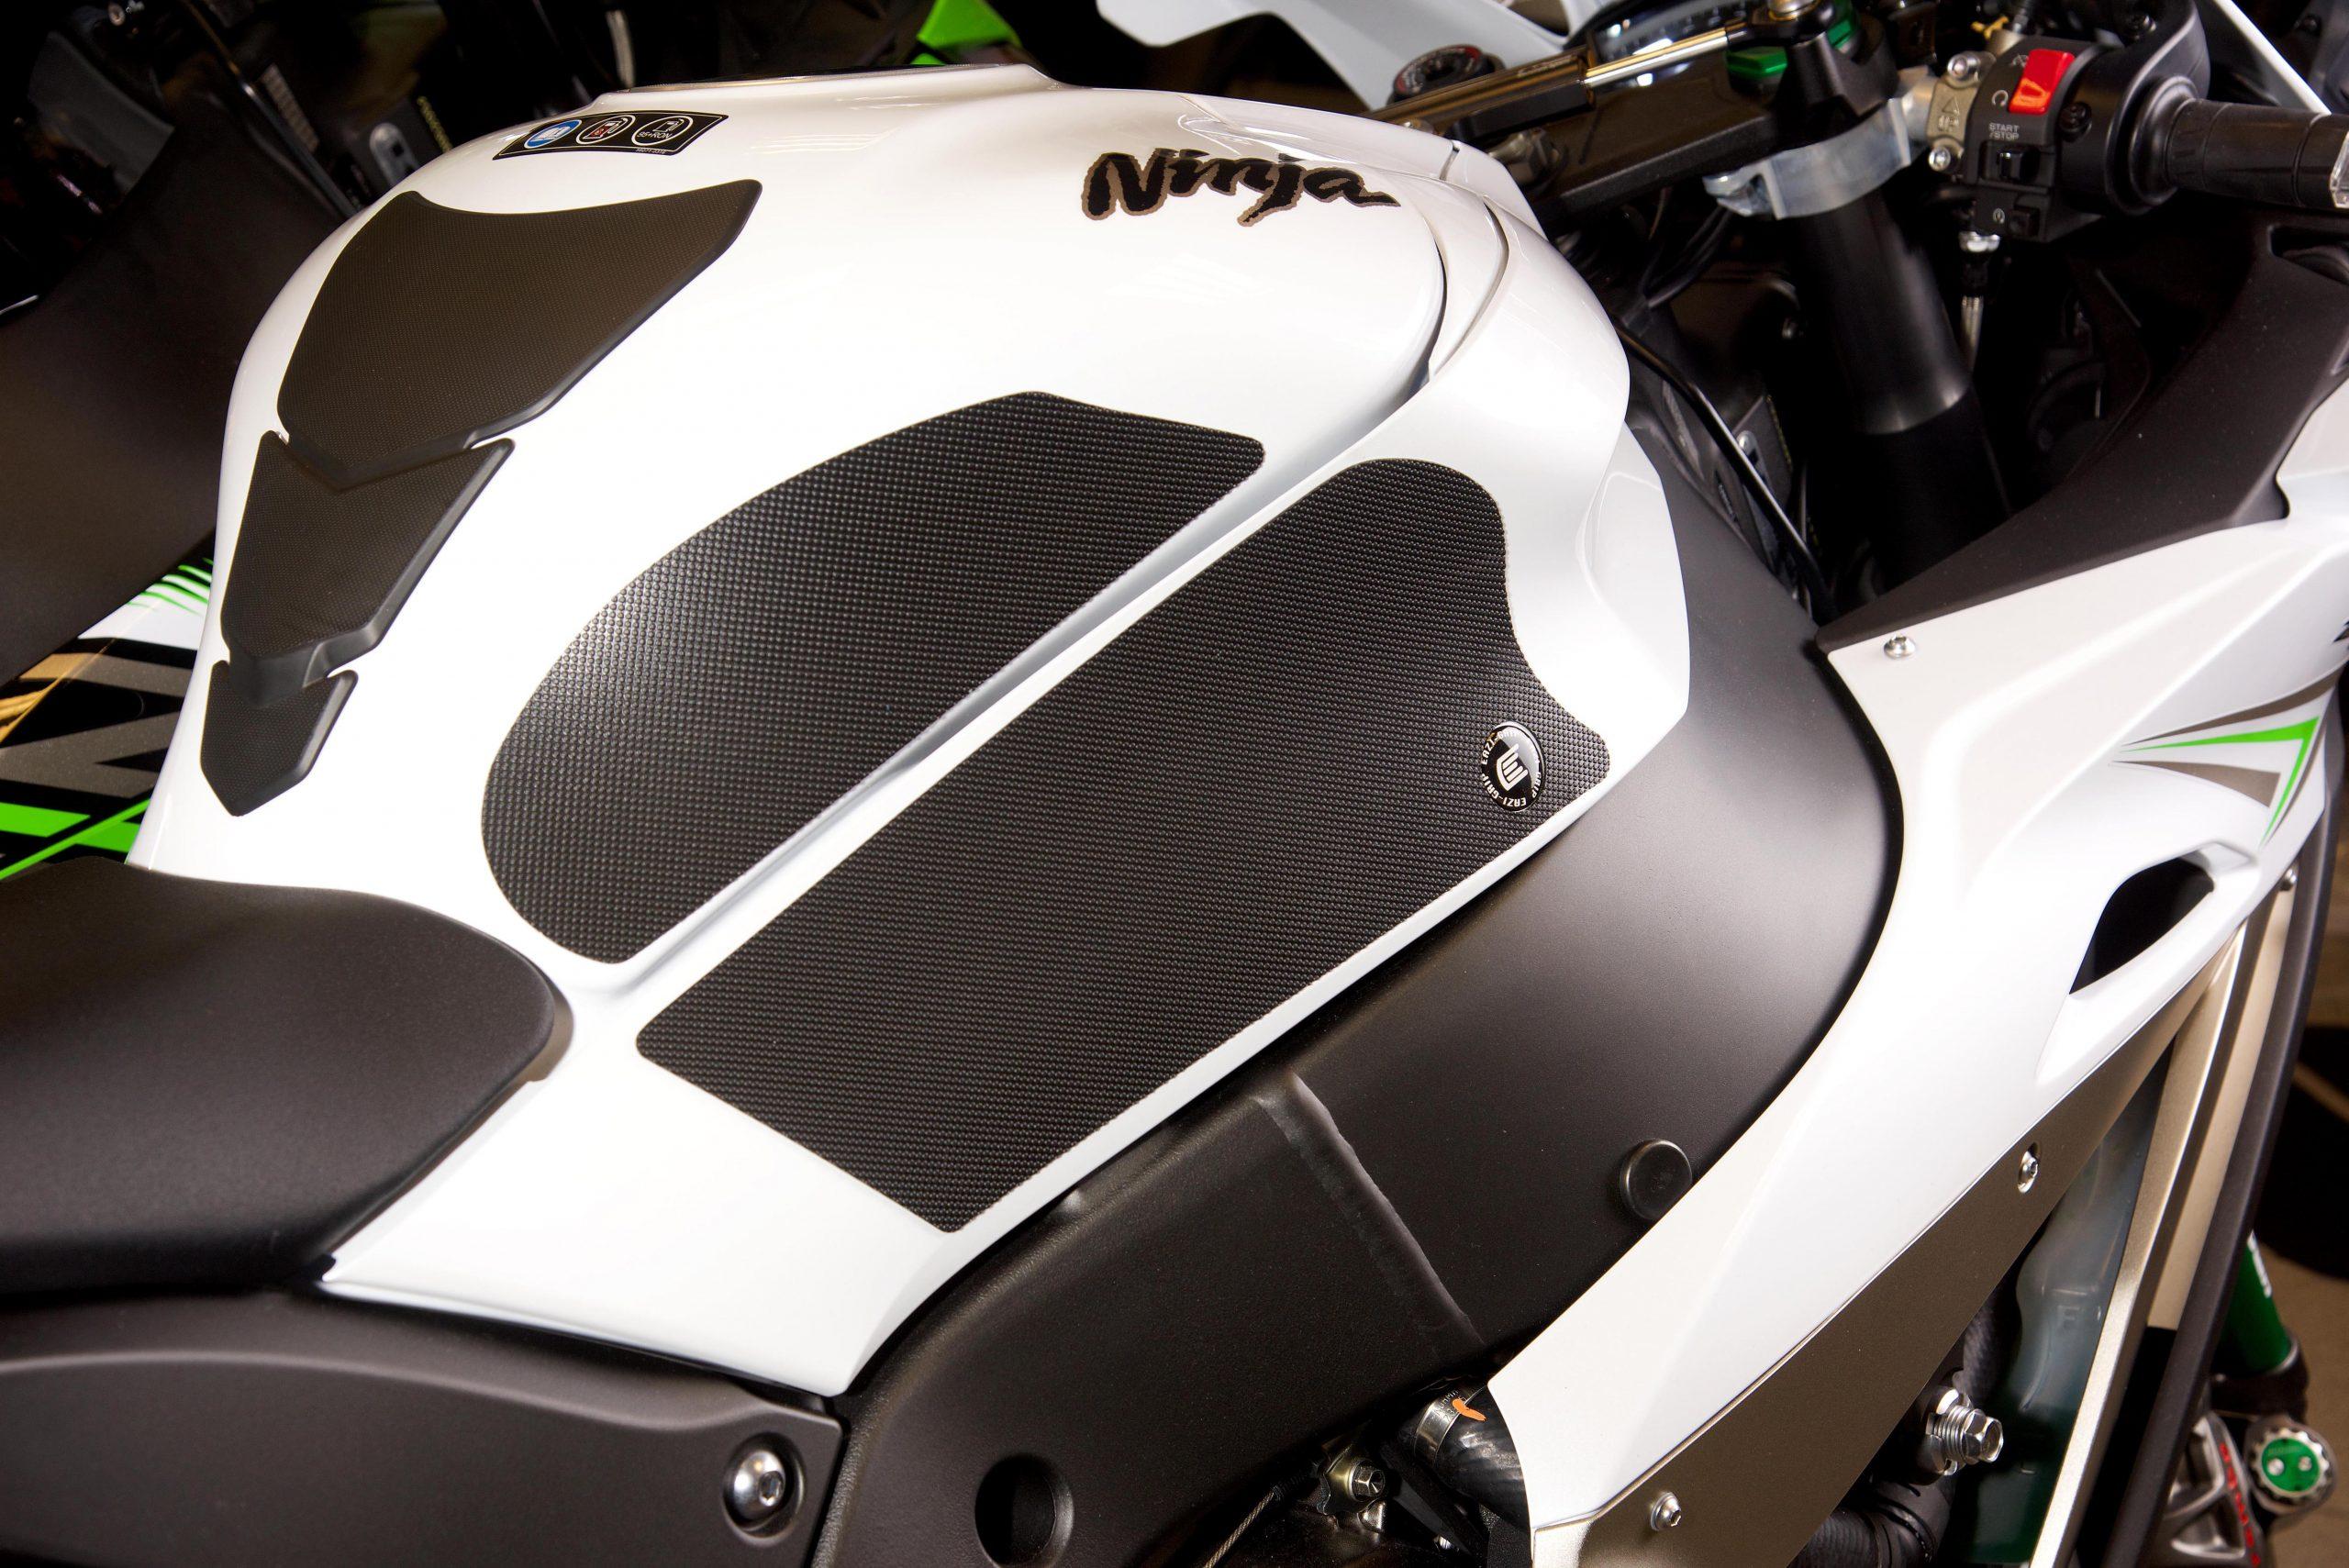 Eazi-Grip PRO Kawasaki ZX10R Tank Grips in Clear 2016-2017